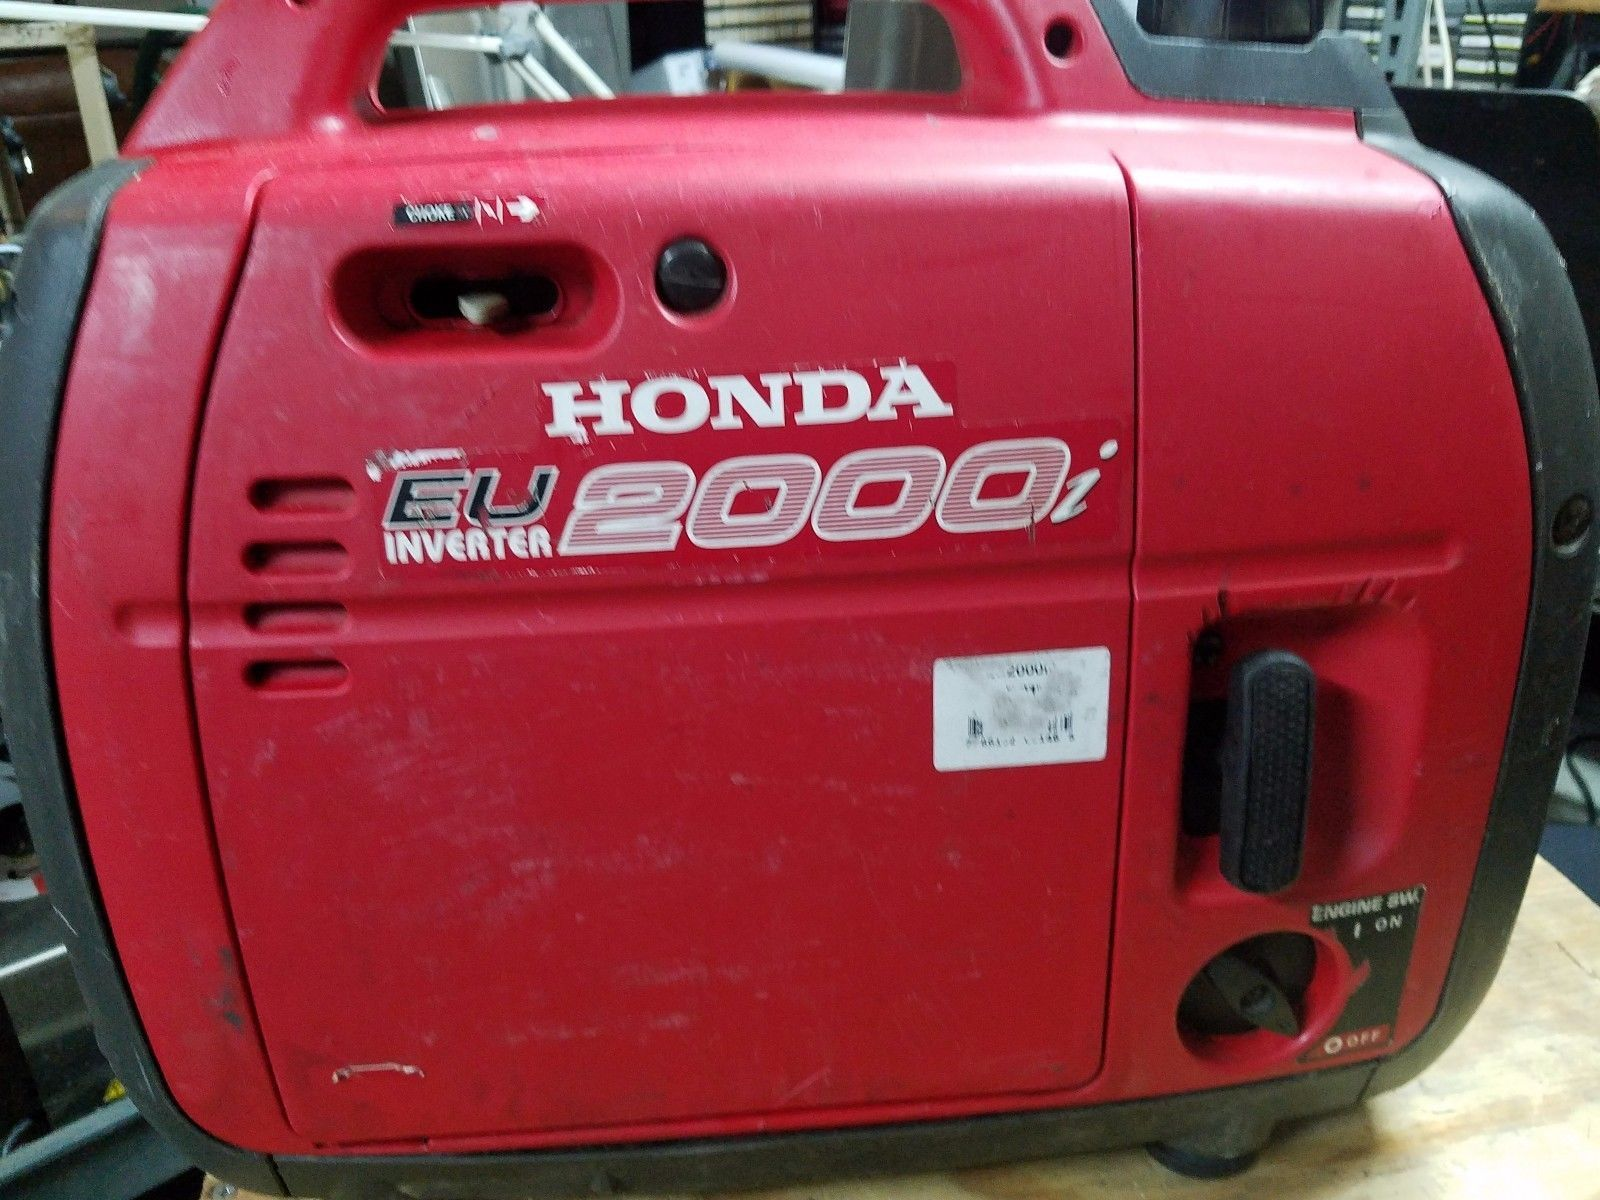 Honda 2000 Watt HP Portable Generator W/ Inverter